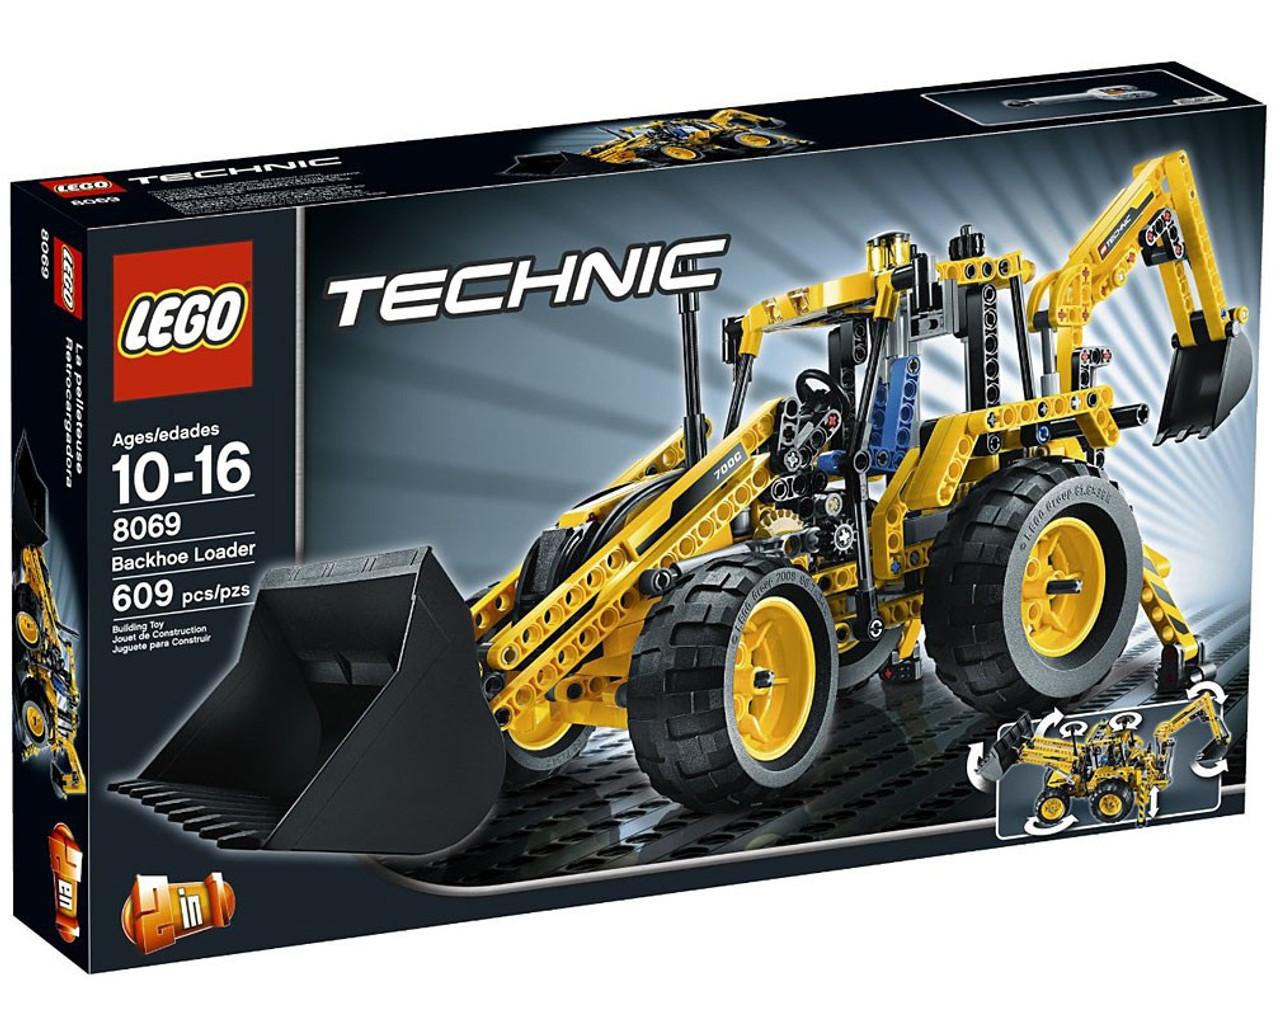 LEGO Technic Backhoe Loader Set #8069